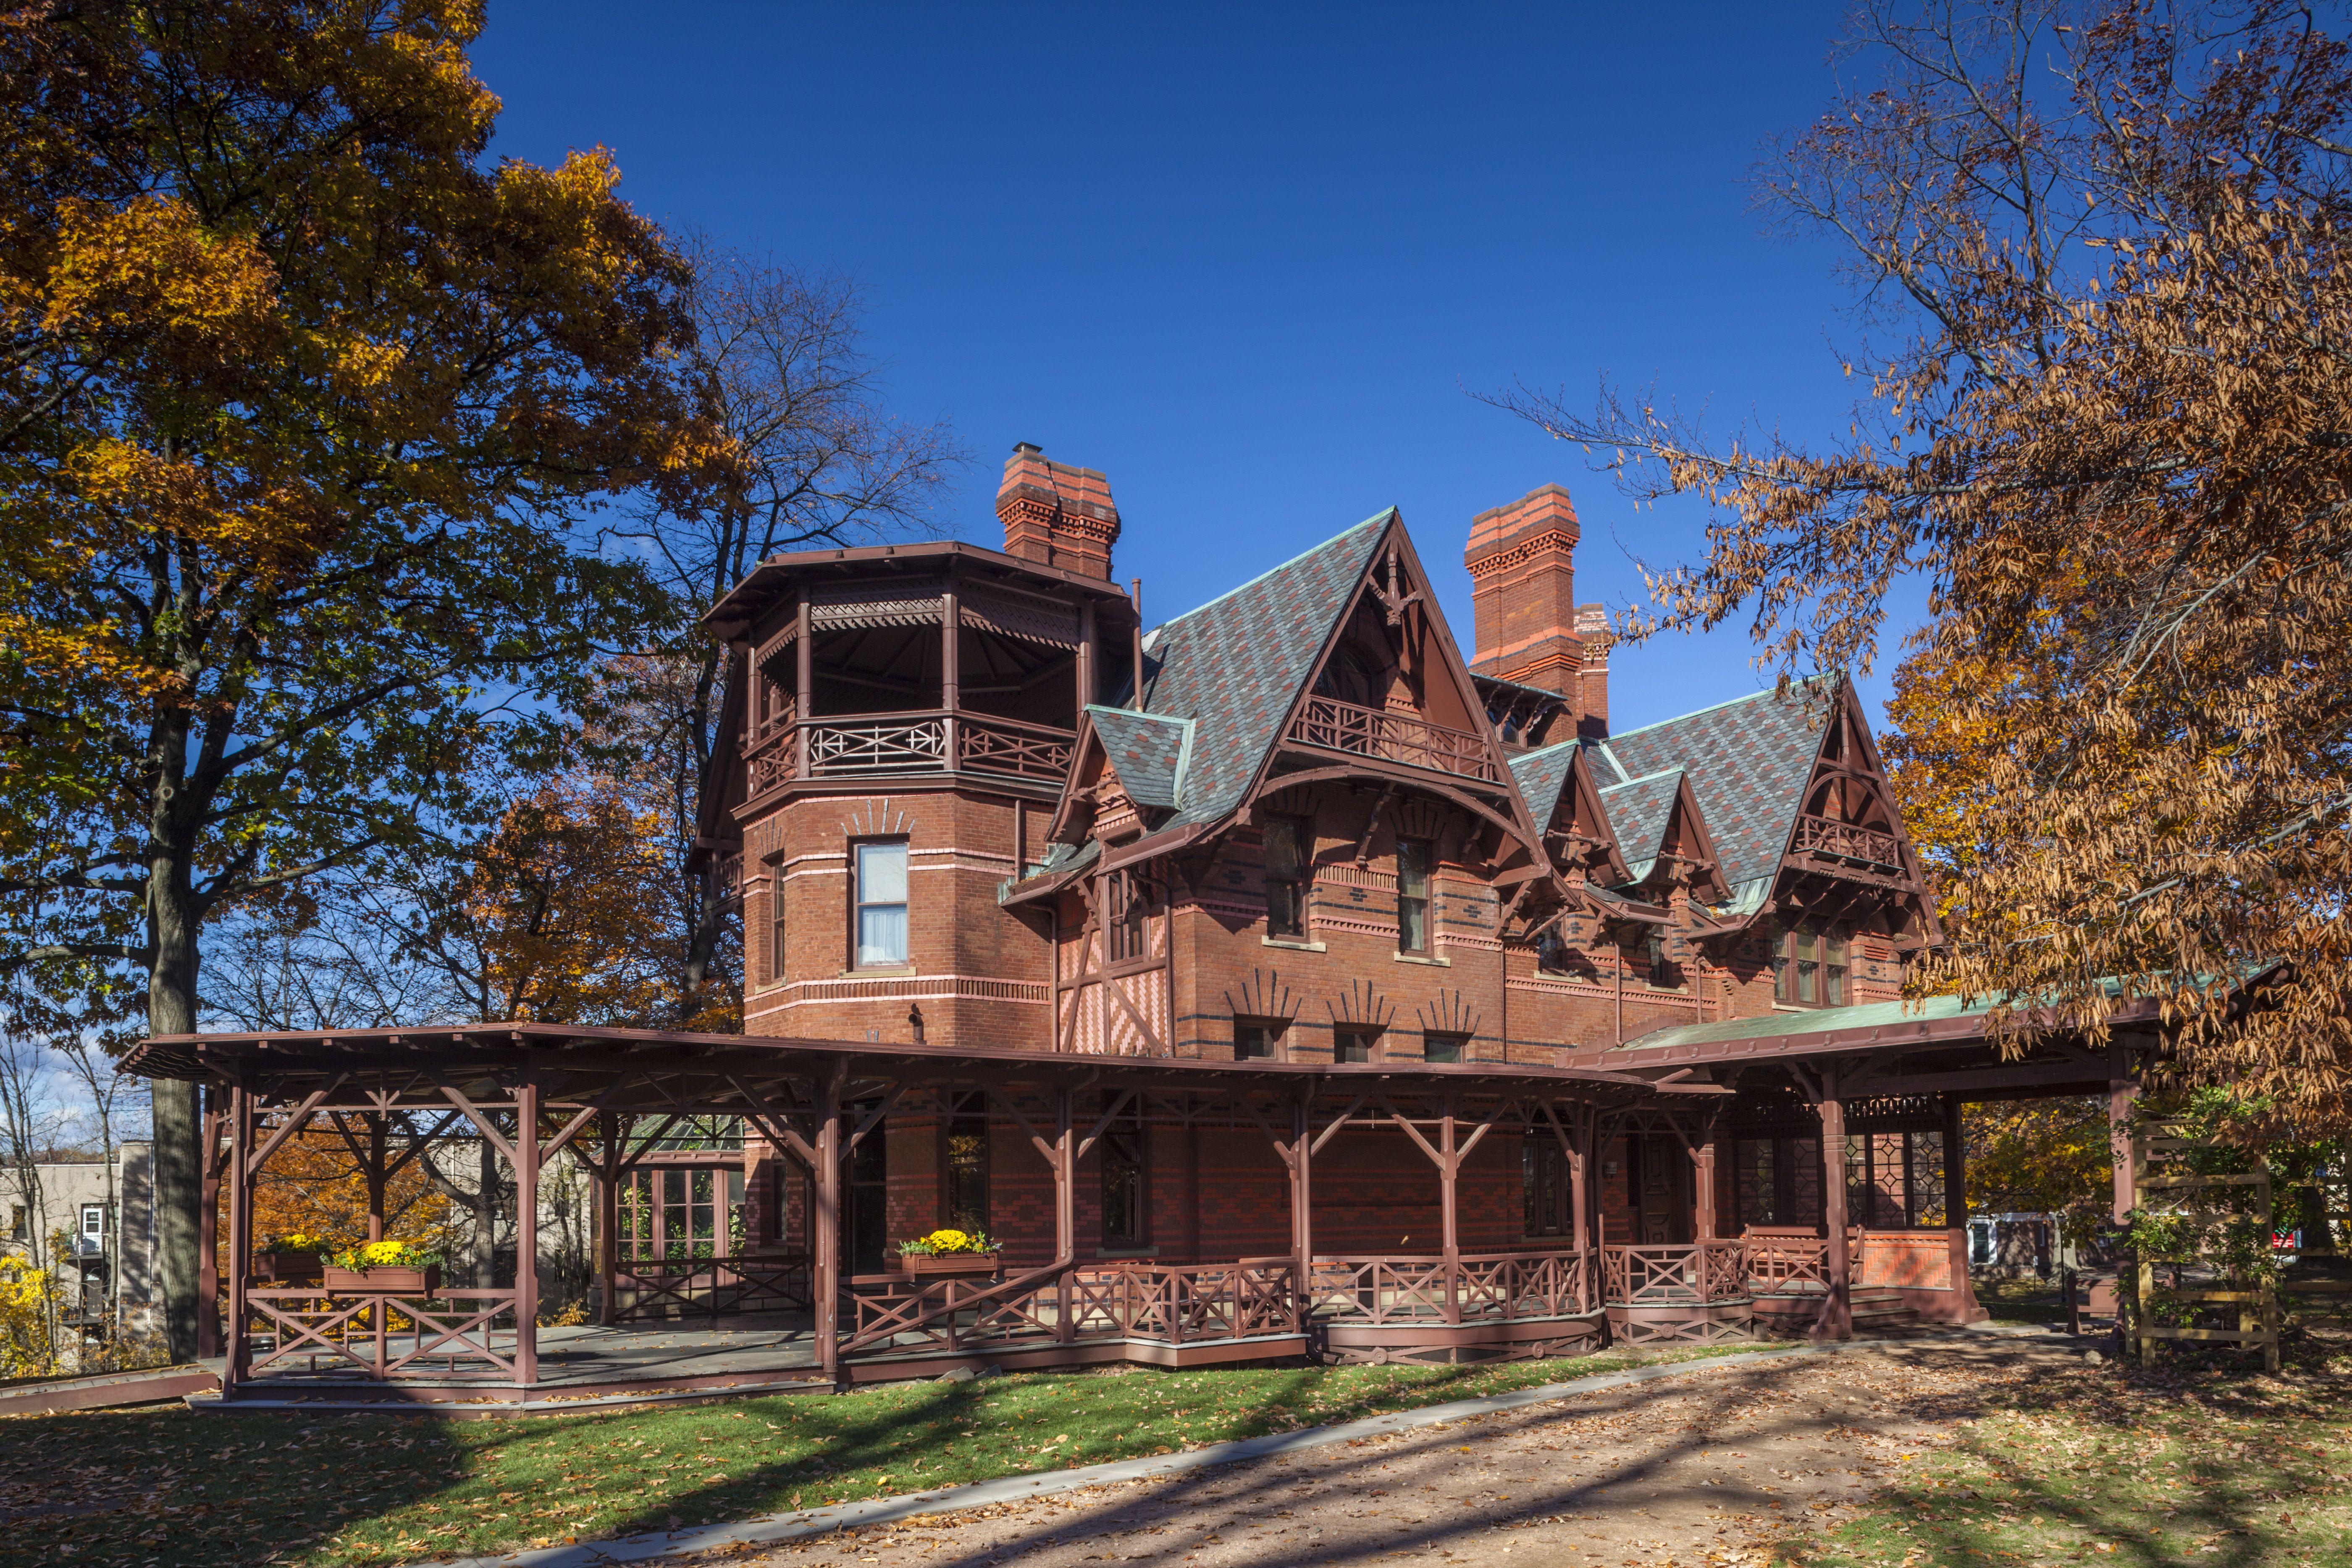 USA, Connecticut, Hartford, Mark Twain House, former home of celebrated American writer Mark Twain in autumn